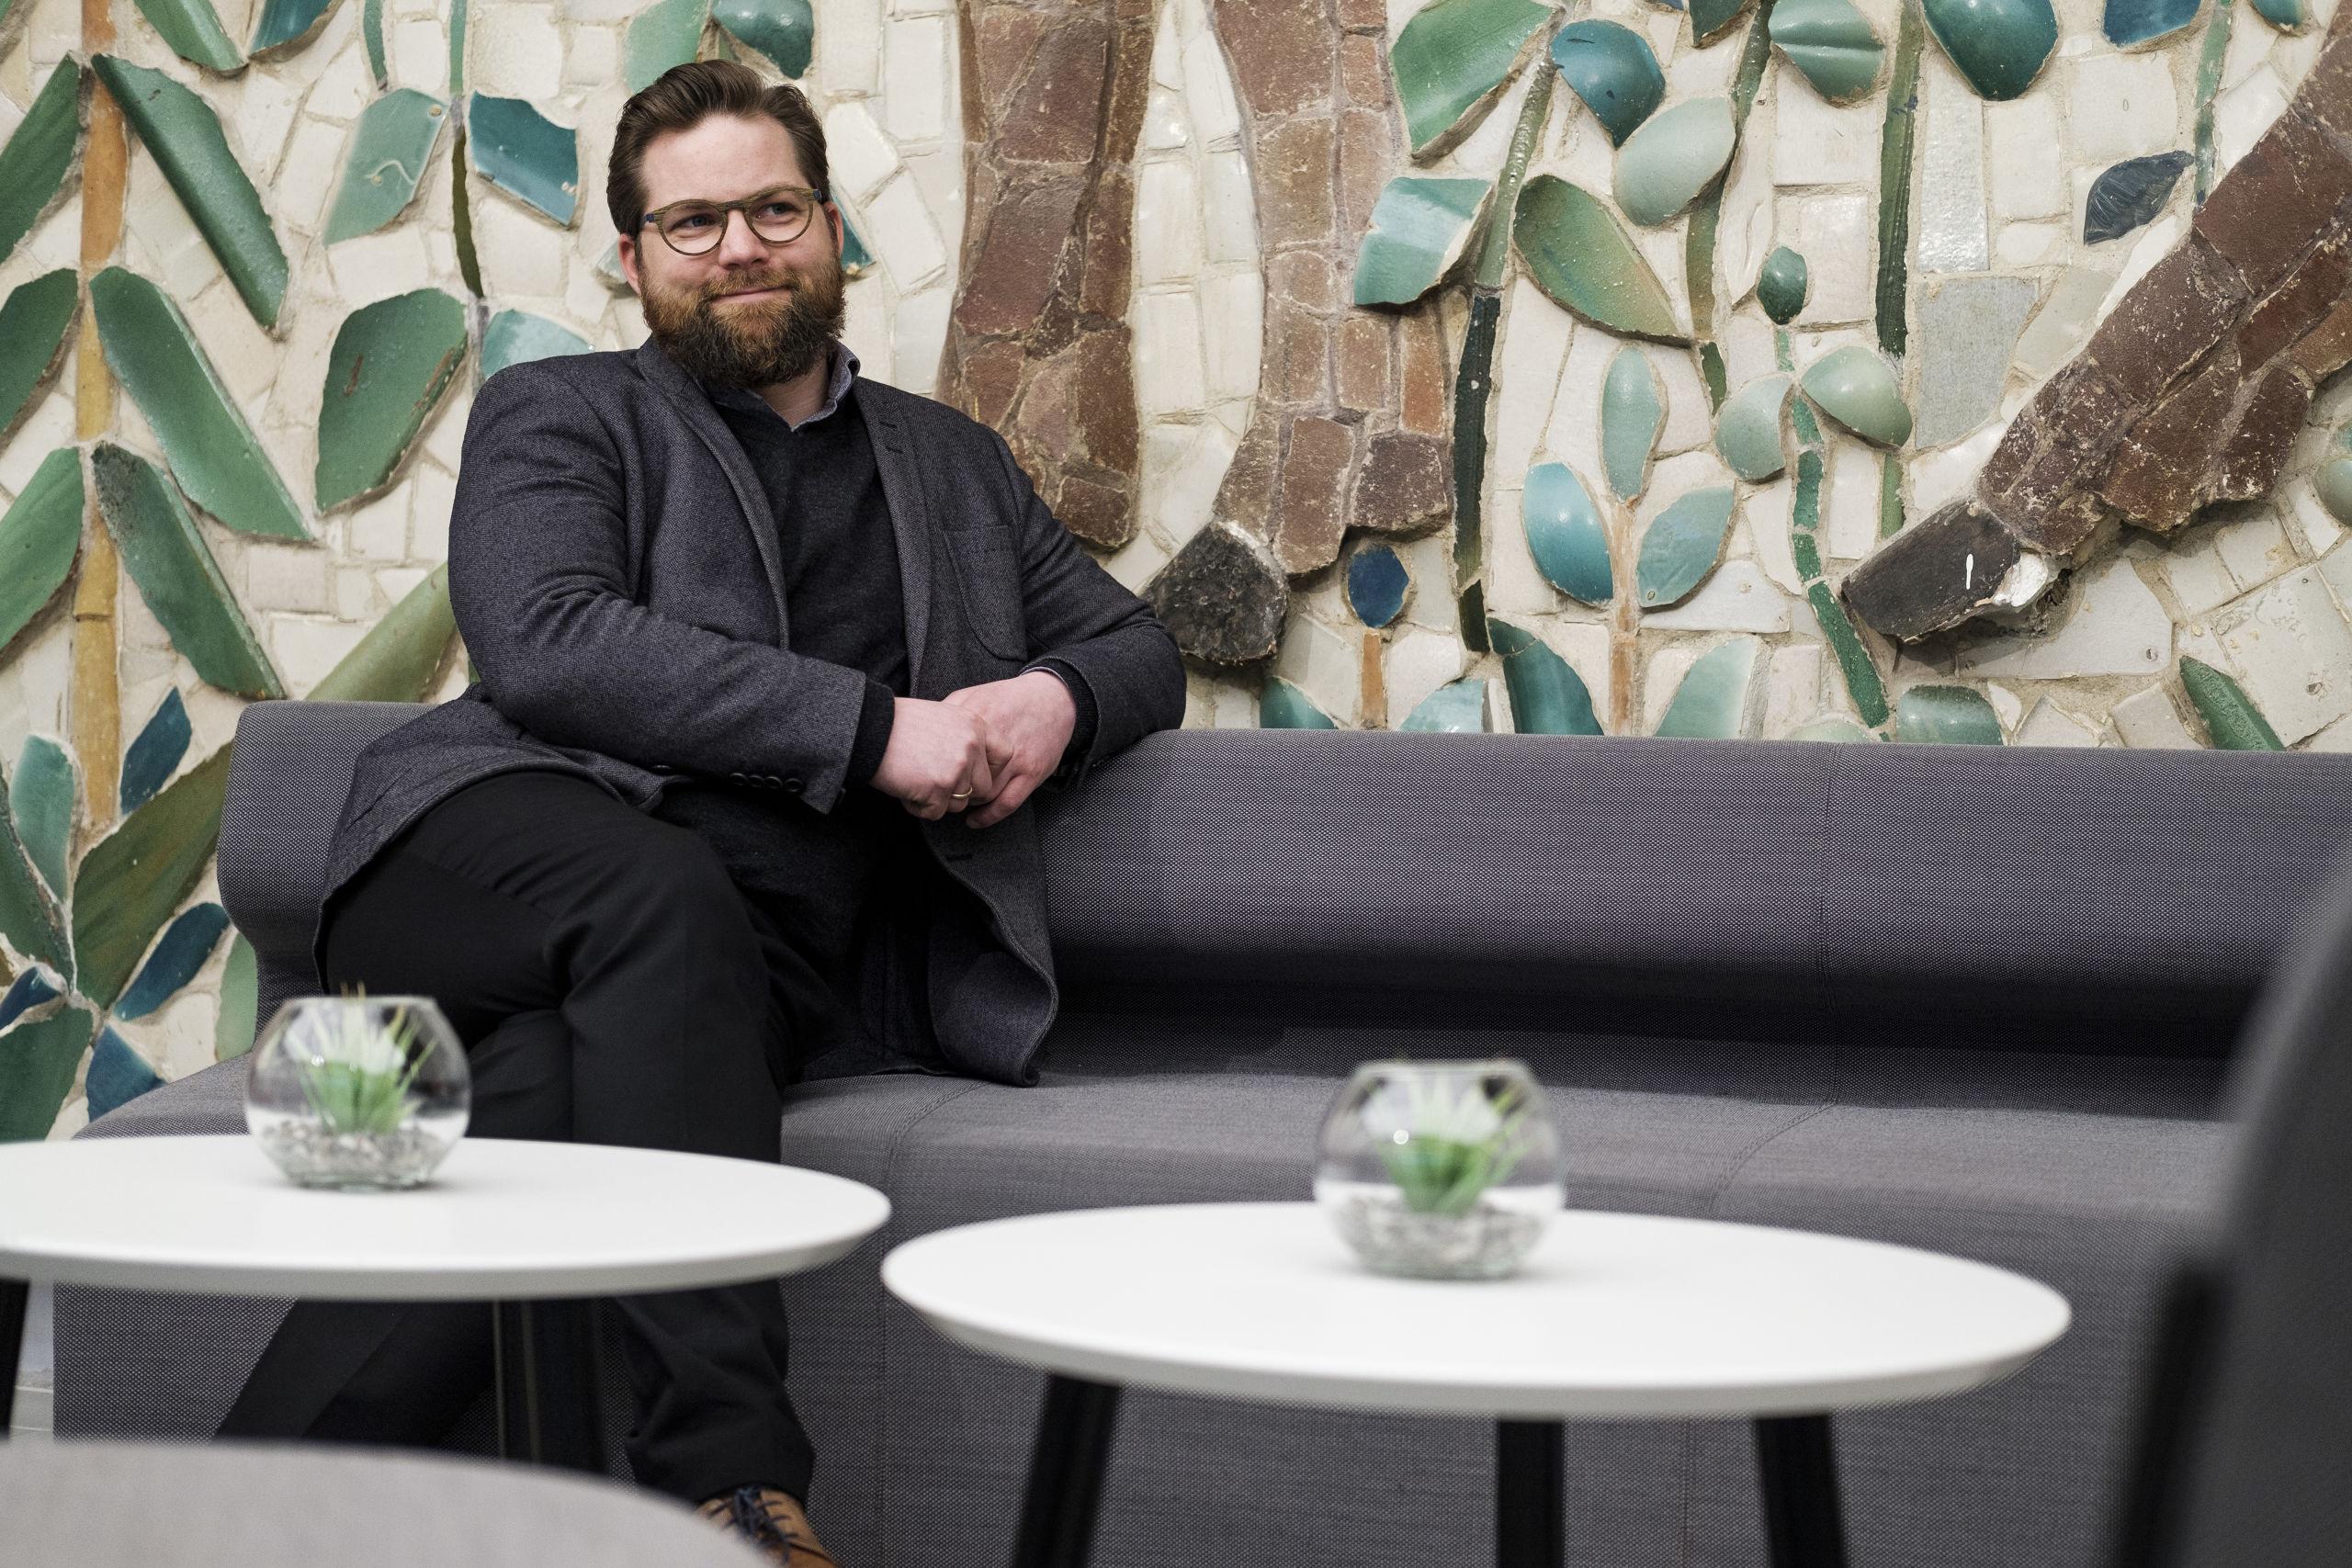 Nicolaj Holm ser lyst på Aalborgs fremtid som stor kulturby. Foto: Lasse Sand